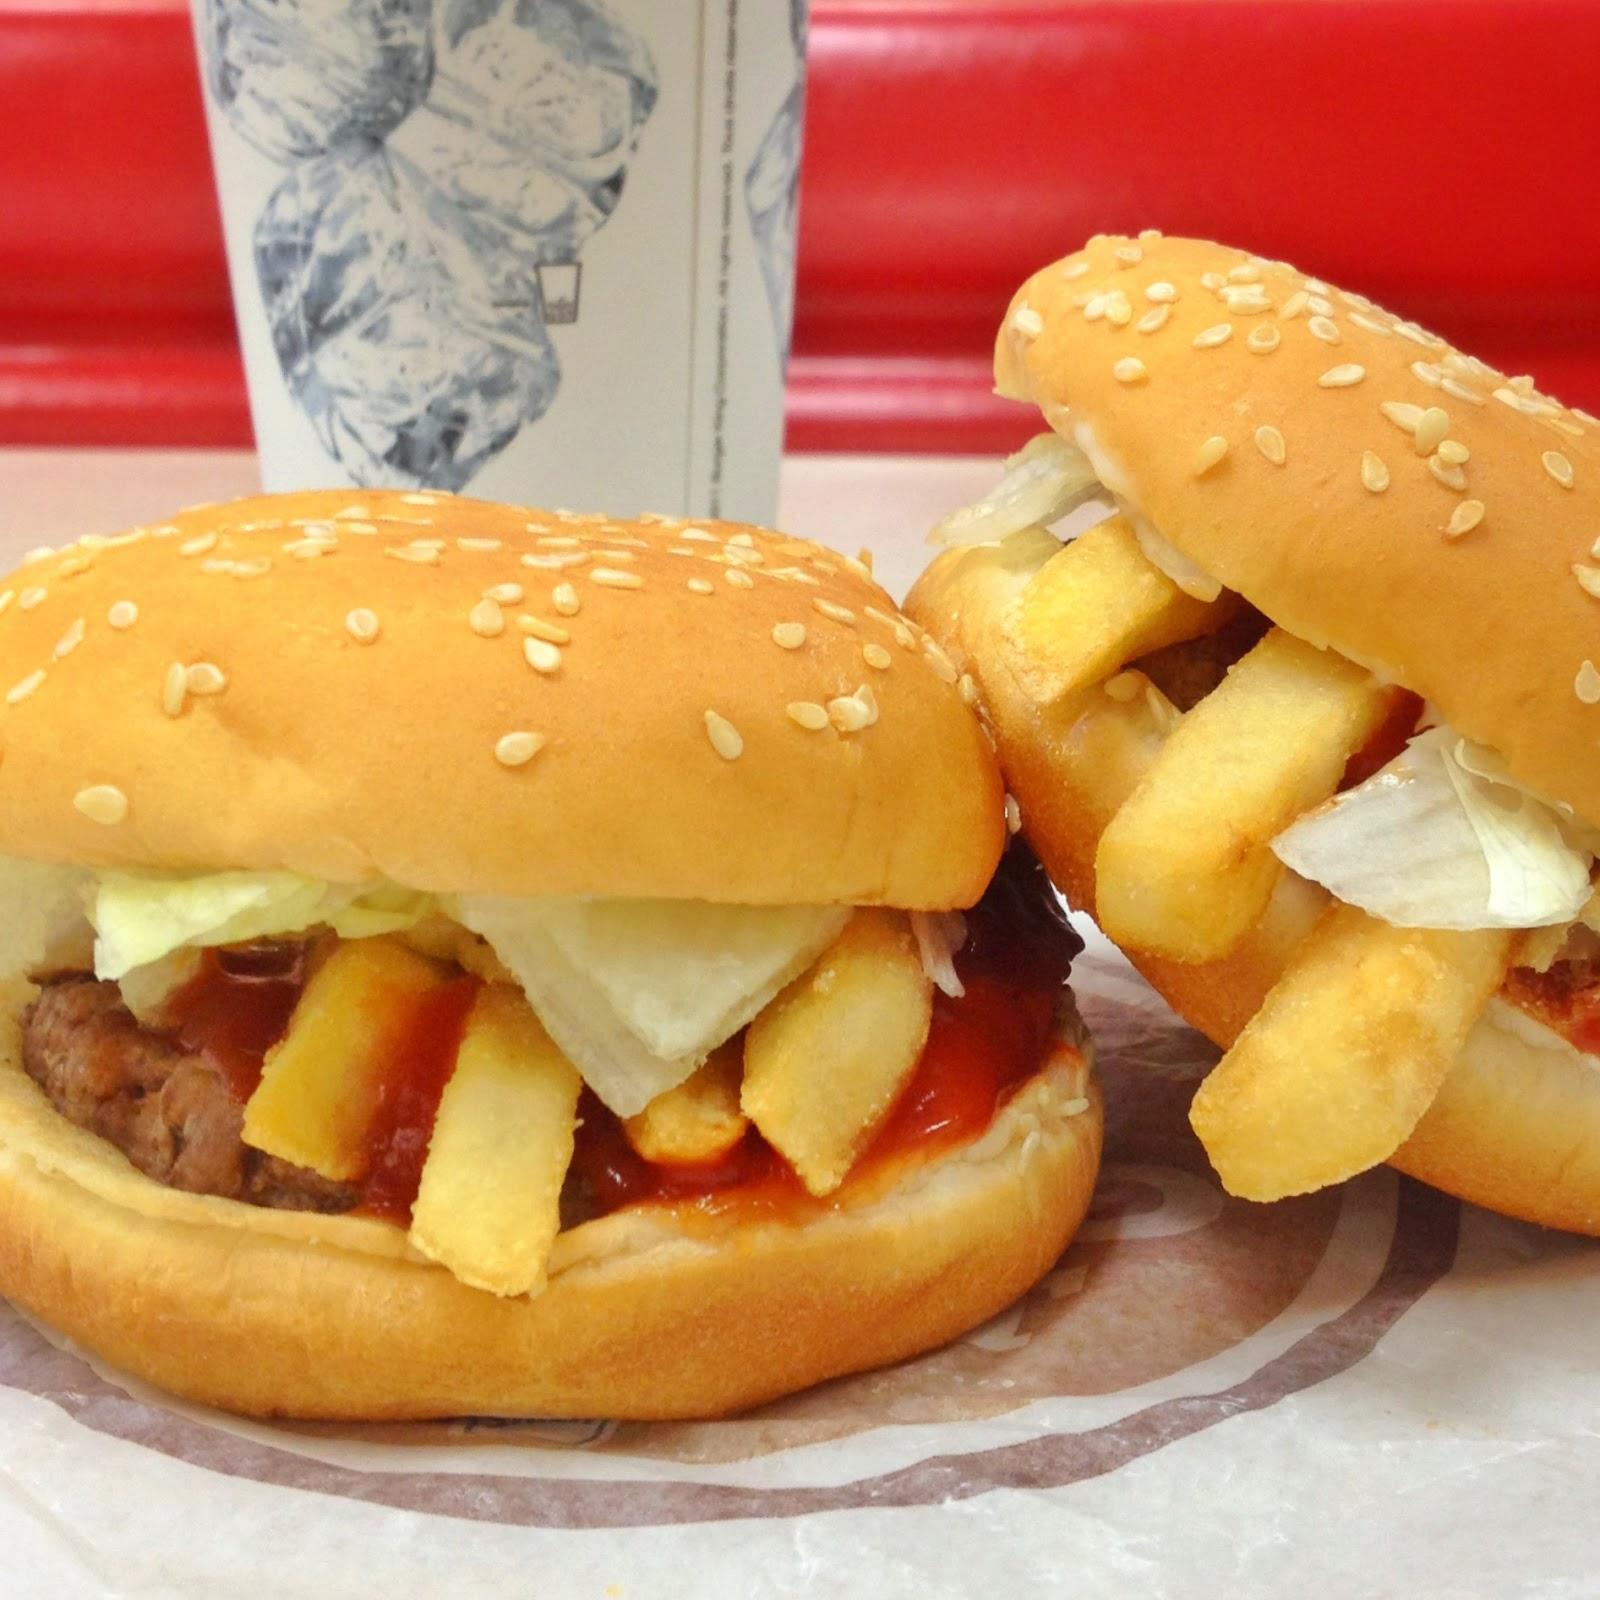 Burger King French Fry Burger: finalmente le patatine fritte dentro il panino!